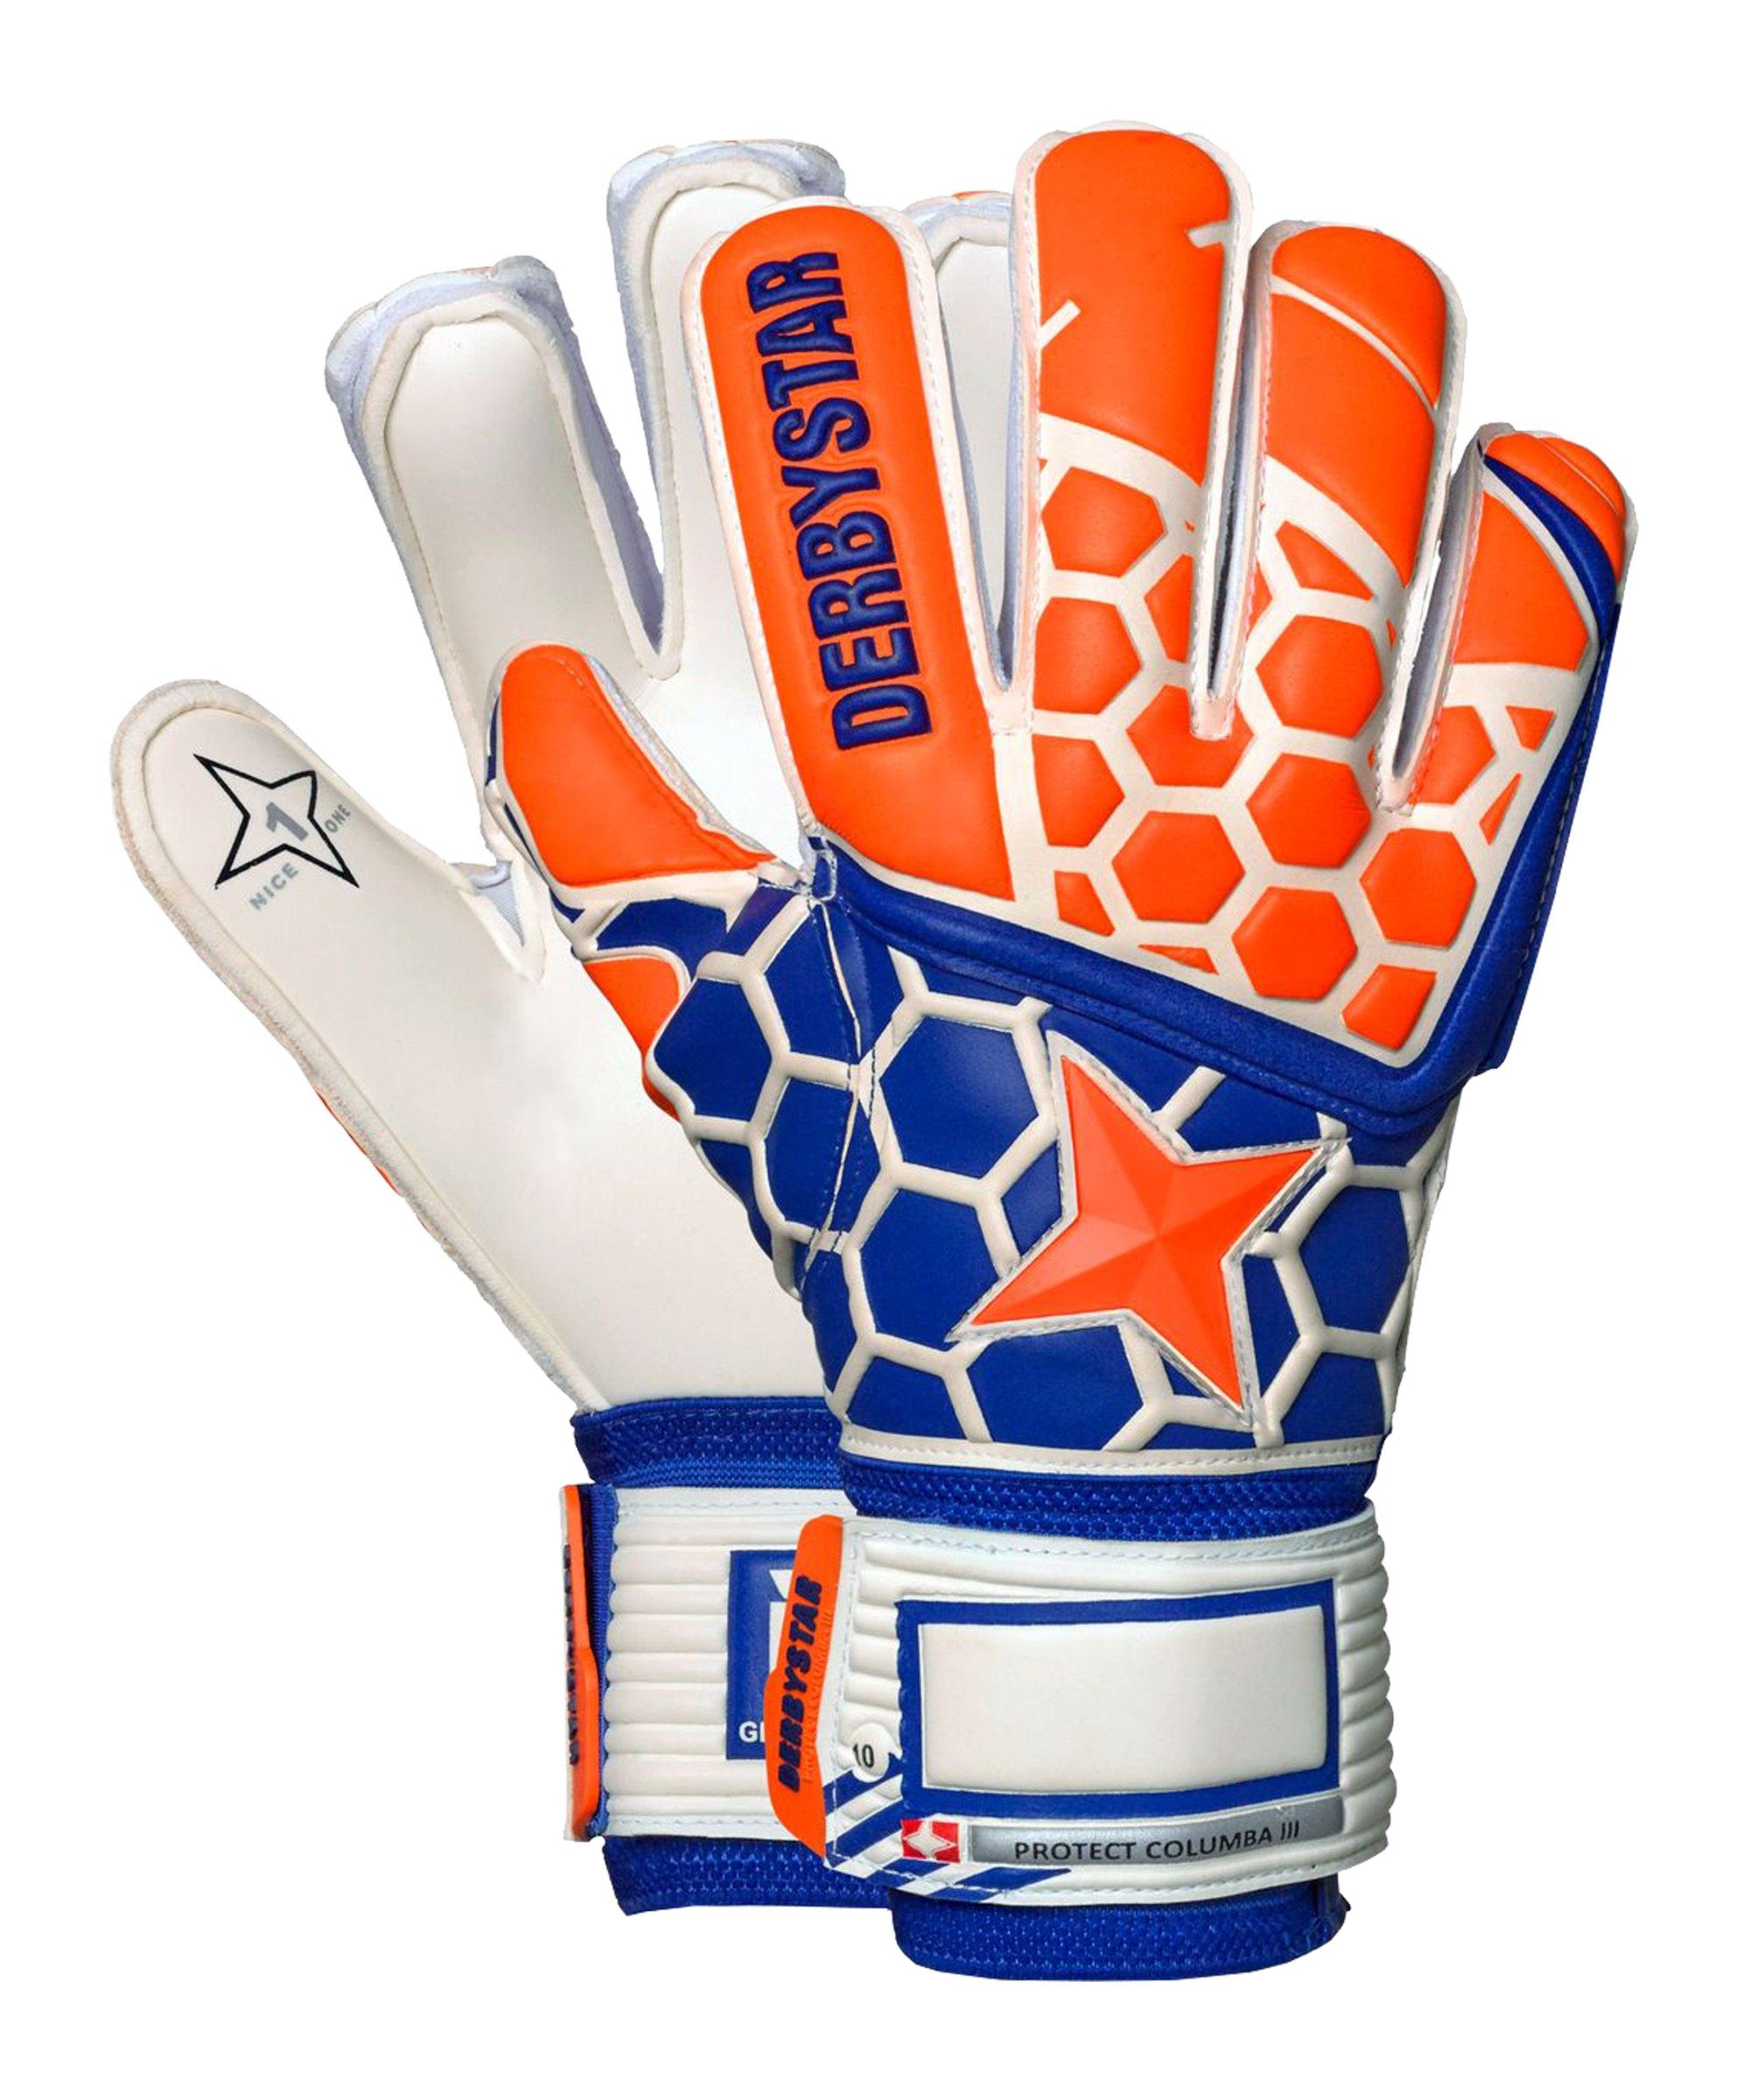 Derbystar Protect Columba III TW-Handschuh Orange - orange